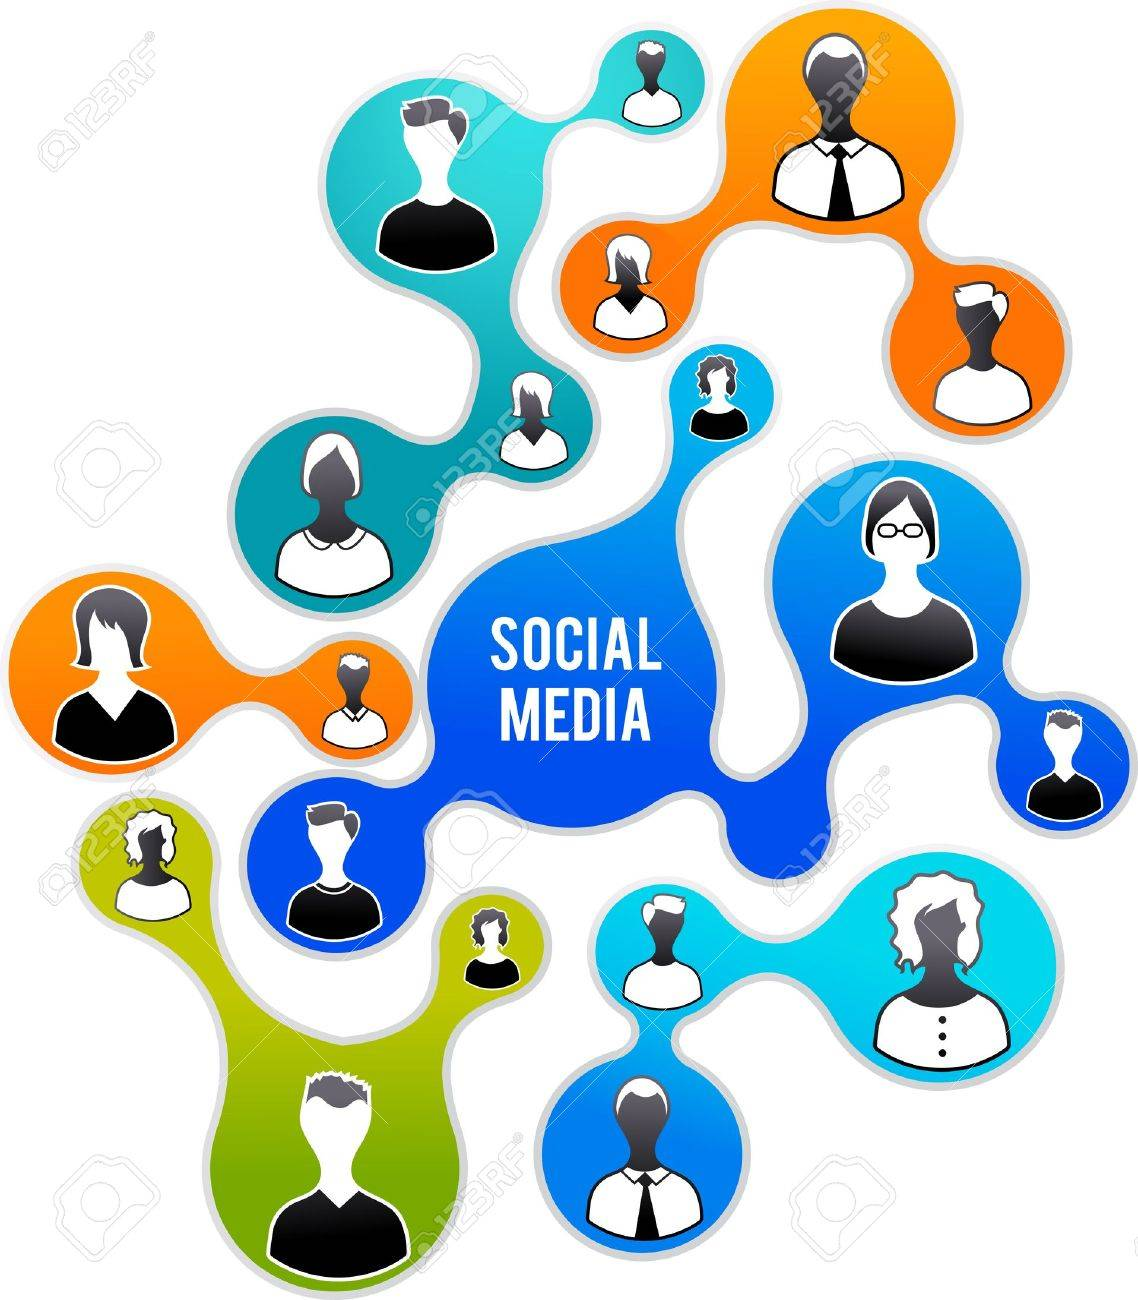 Social Media and network illustration Stock Vector - 12874791